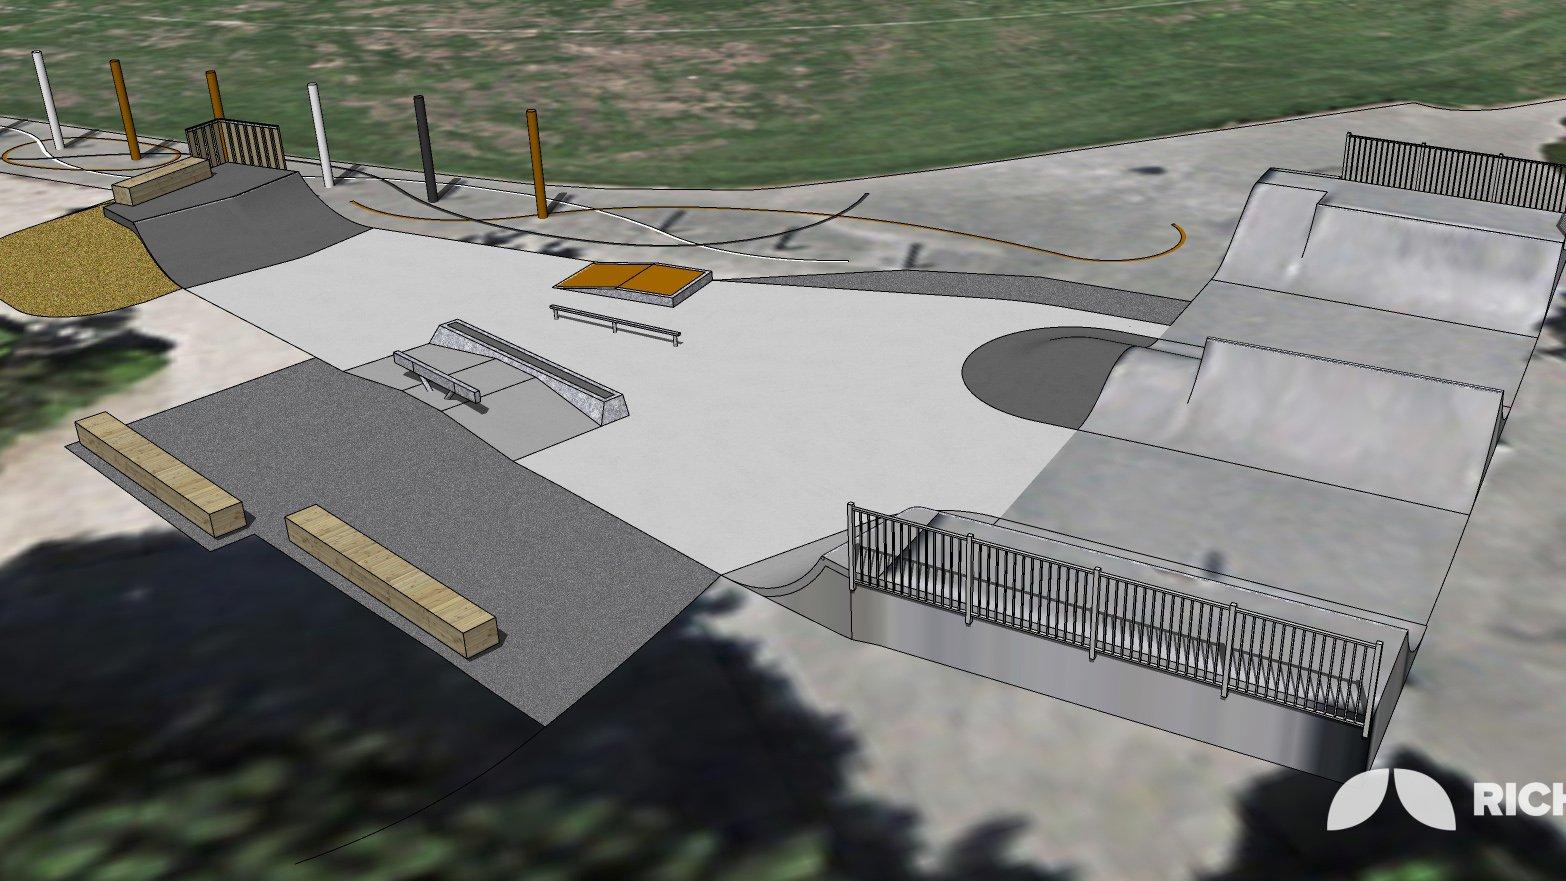 The St Albans skate park extension plan. Image: Newsline / CCC